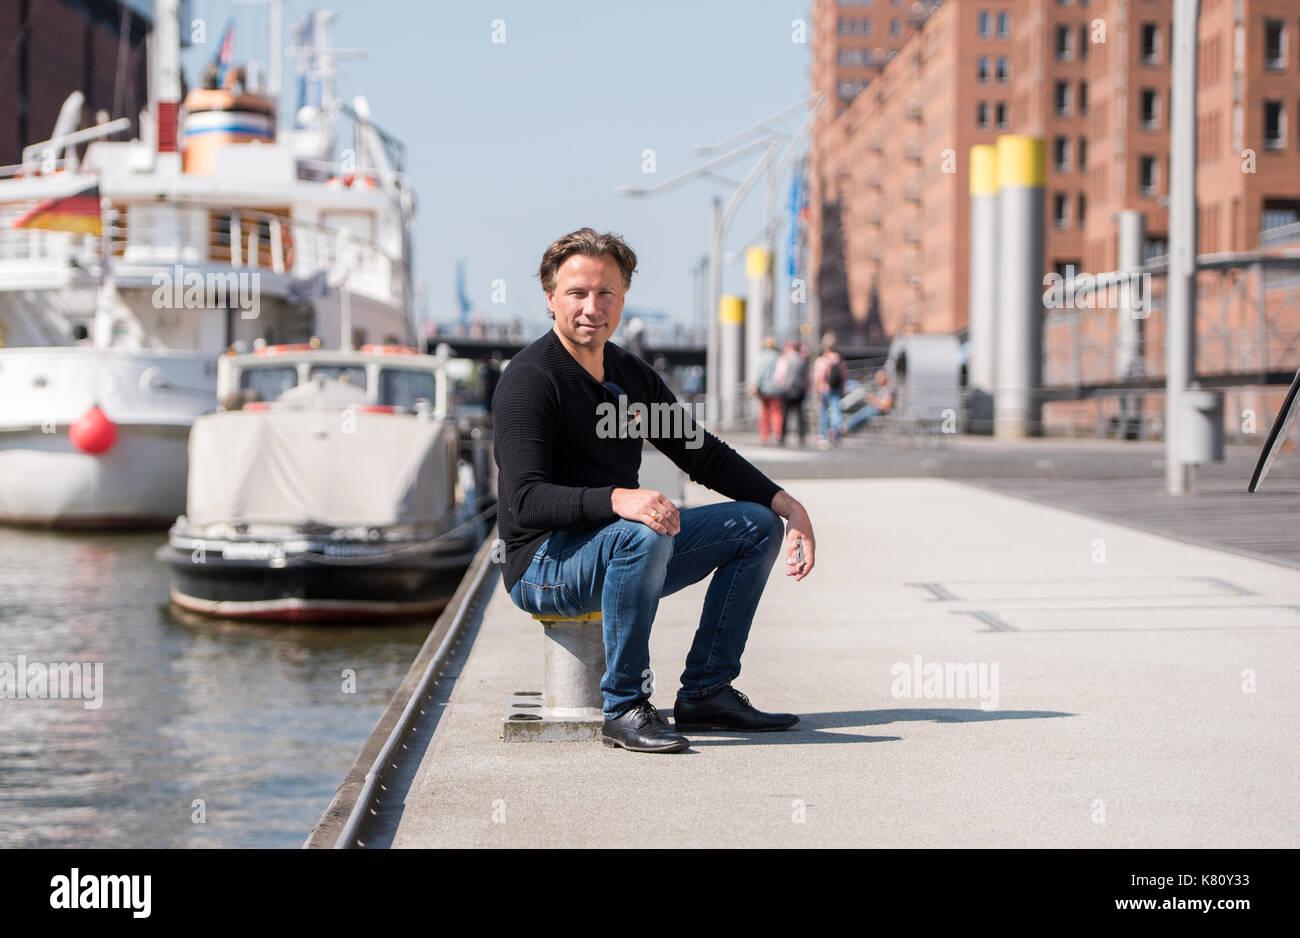 Hamburg, Germany. 29th Aug, 2017. dpa Exclusive - Pianist and conductor Kristjan Jaervi pictured at HafenCity in Hamburg, Germany, 29 August 2017. Photo: Daniel Bockwoldt/dpa/Alamy Live News - Stock Image